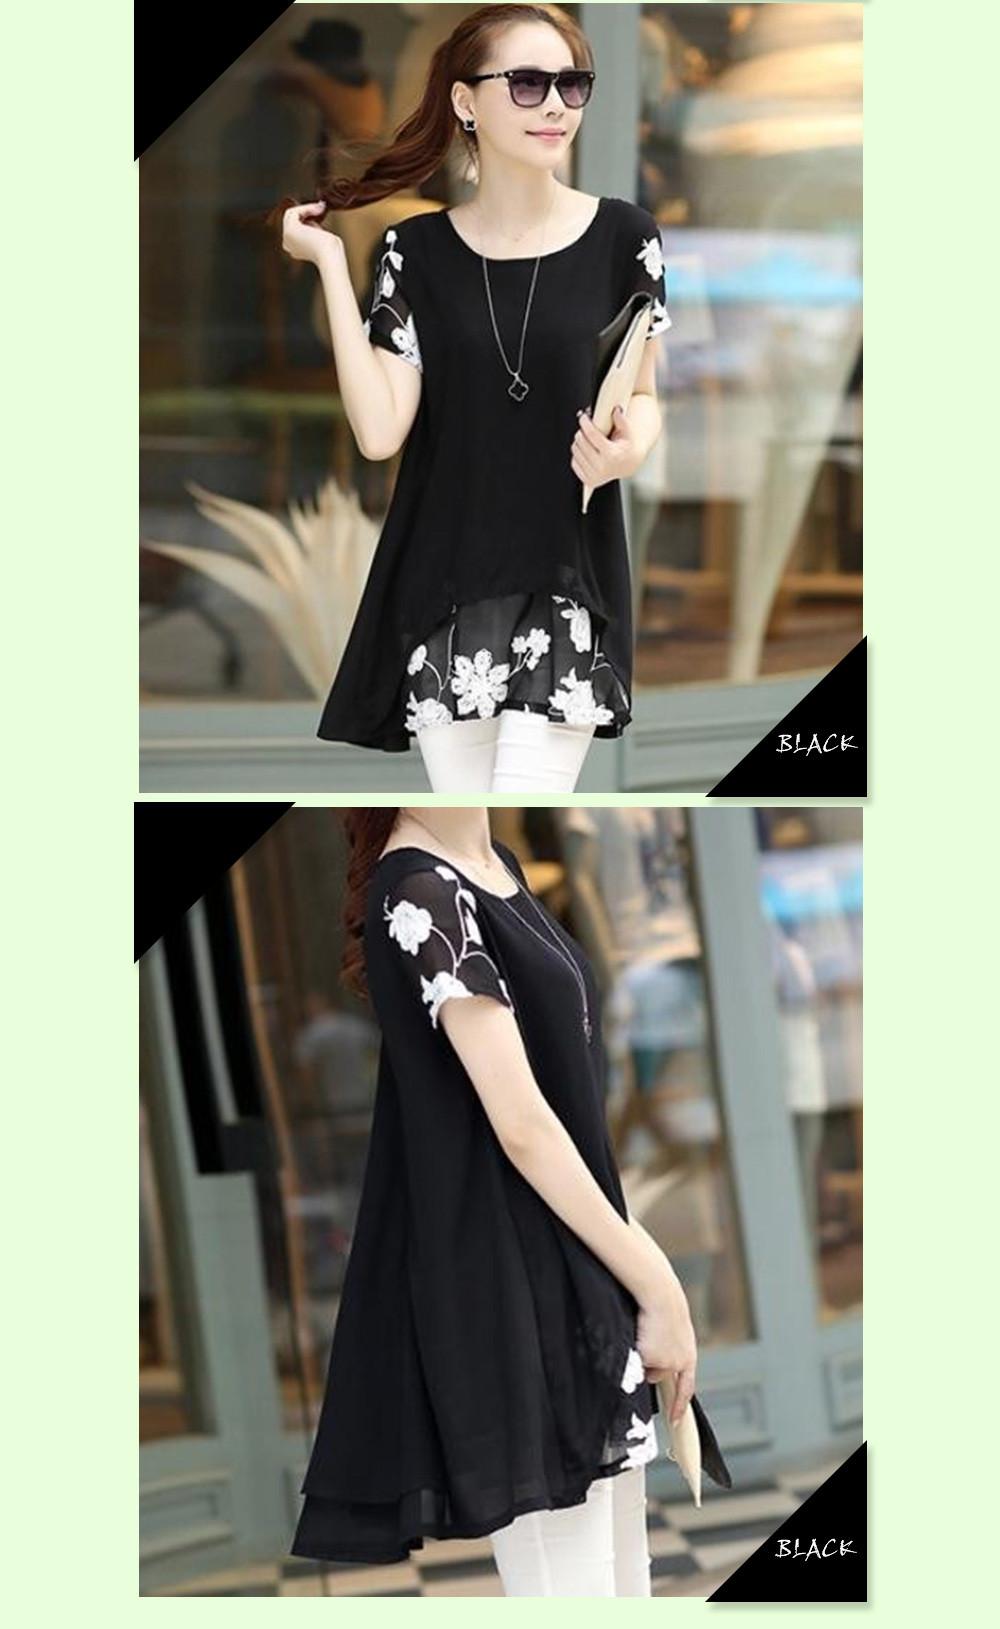 HTB1bhCtOFXXXXcBapXXq6xXFXXXY - Plus Size 5XL Chiffon Blouse Women Clothing Loose Short Sleeve